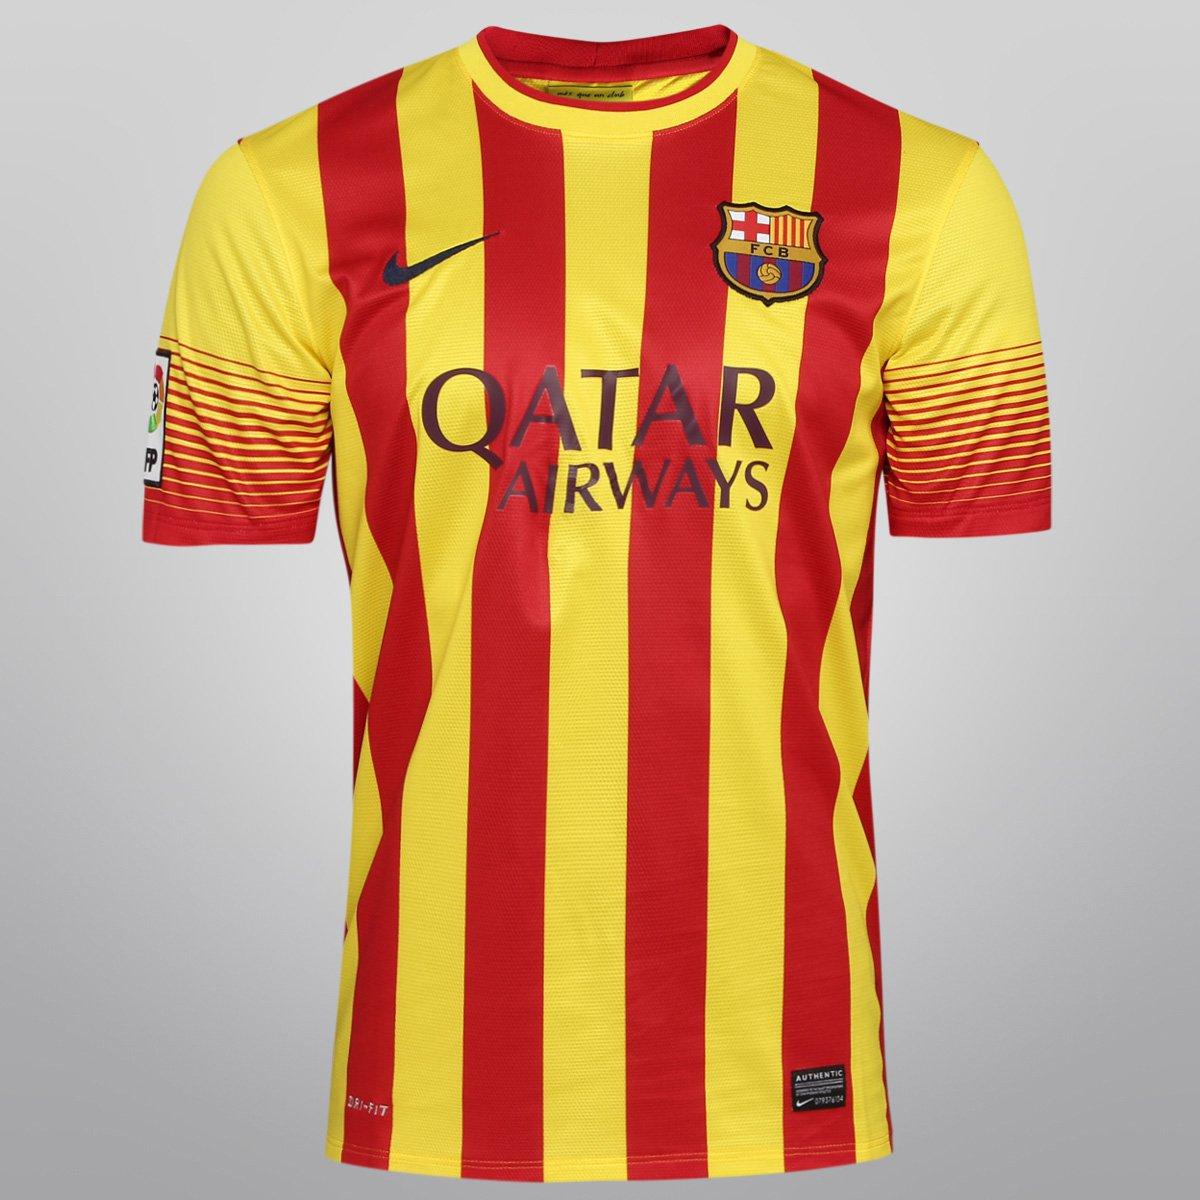 402535cdc1 Camisa Nike Barcelona Away 13 14 s nº - Compre Agora